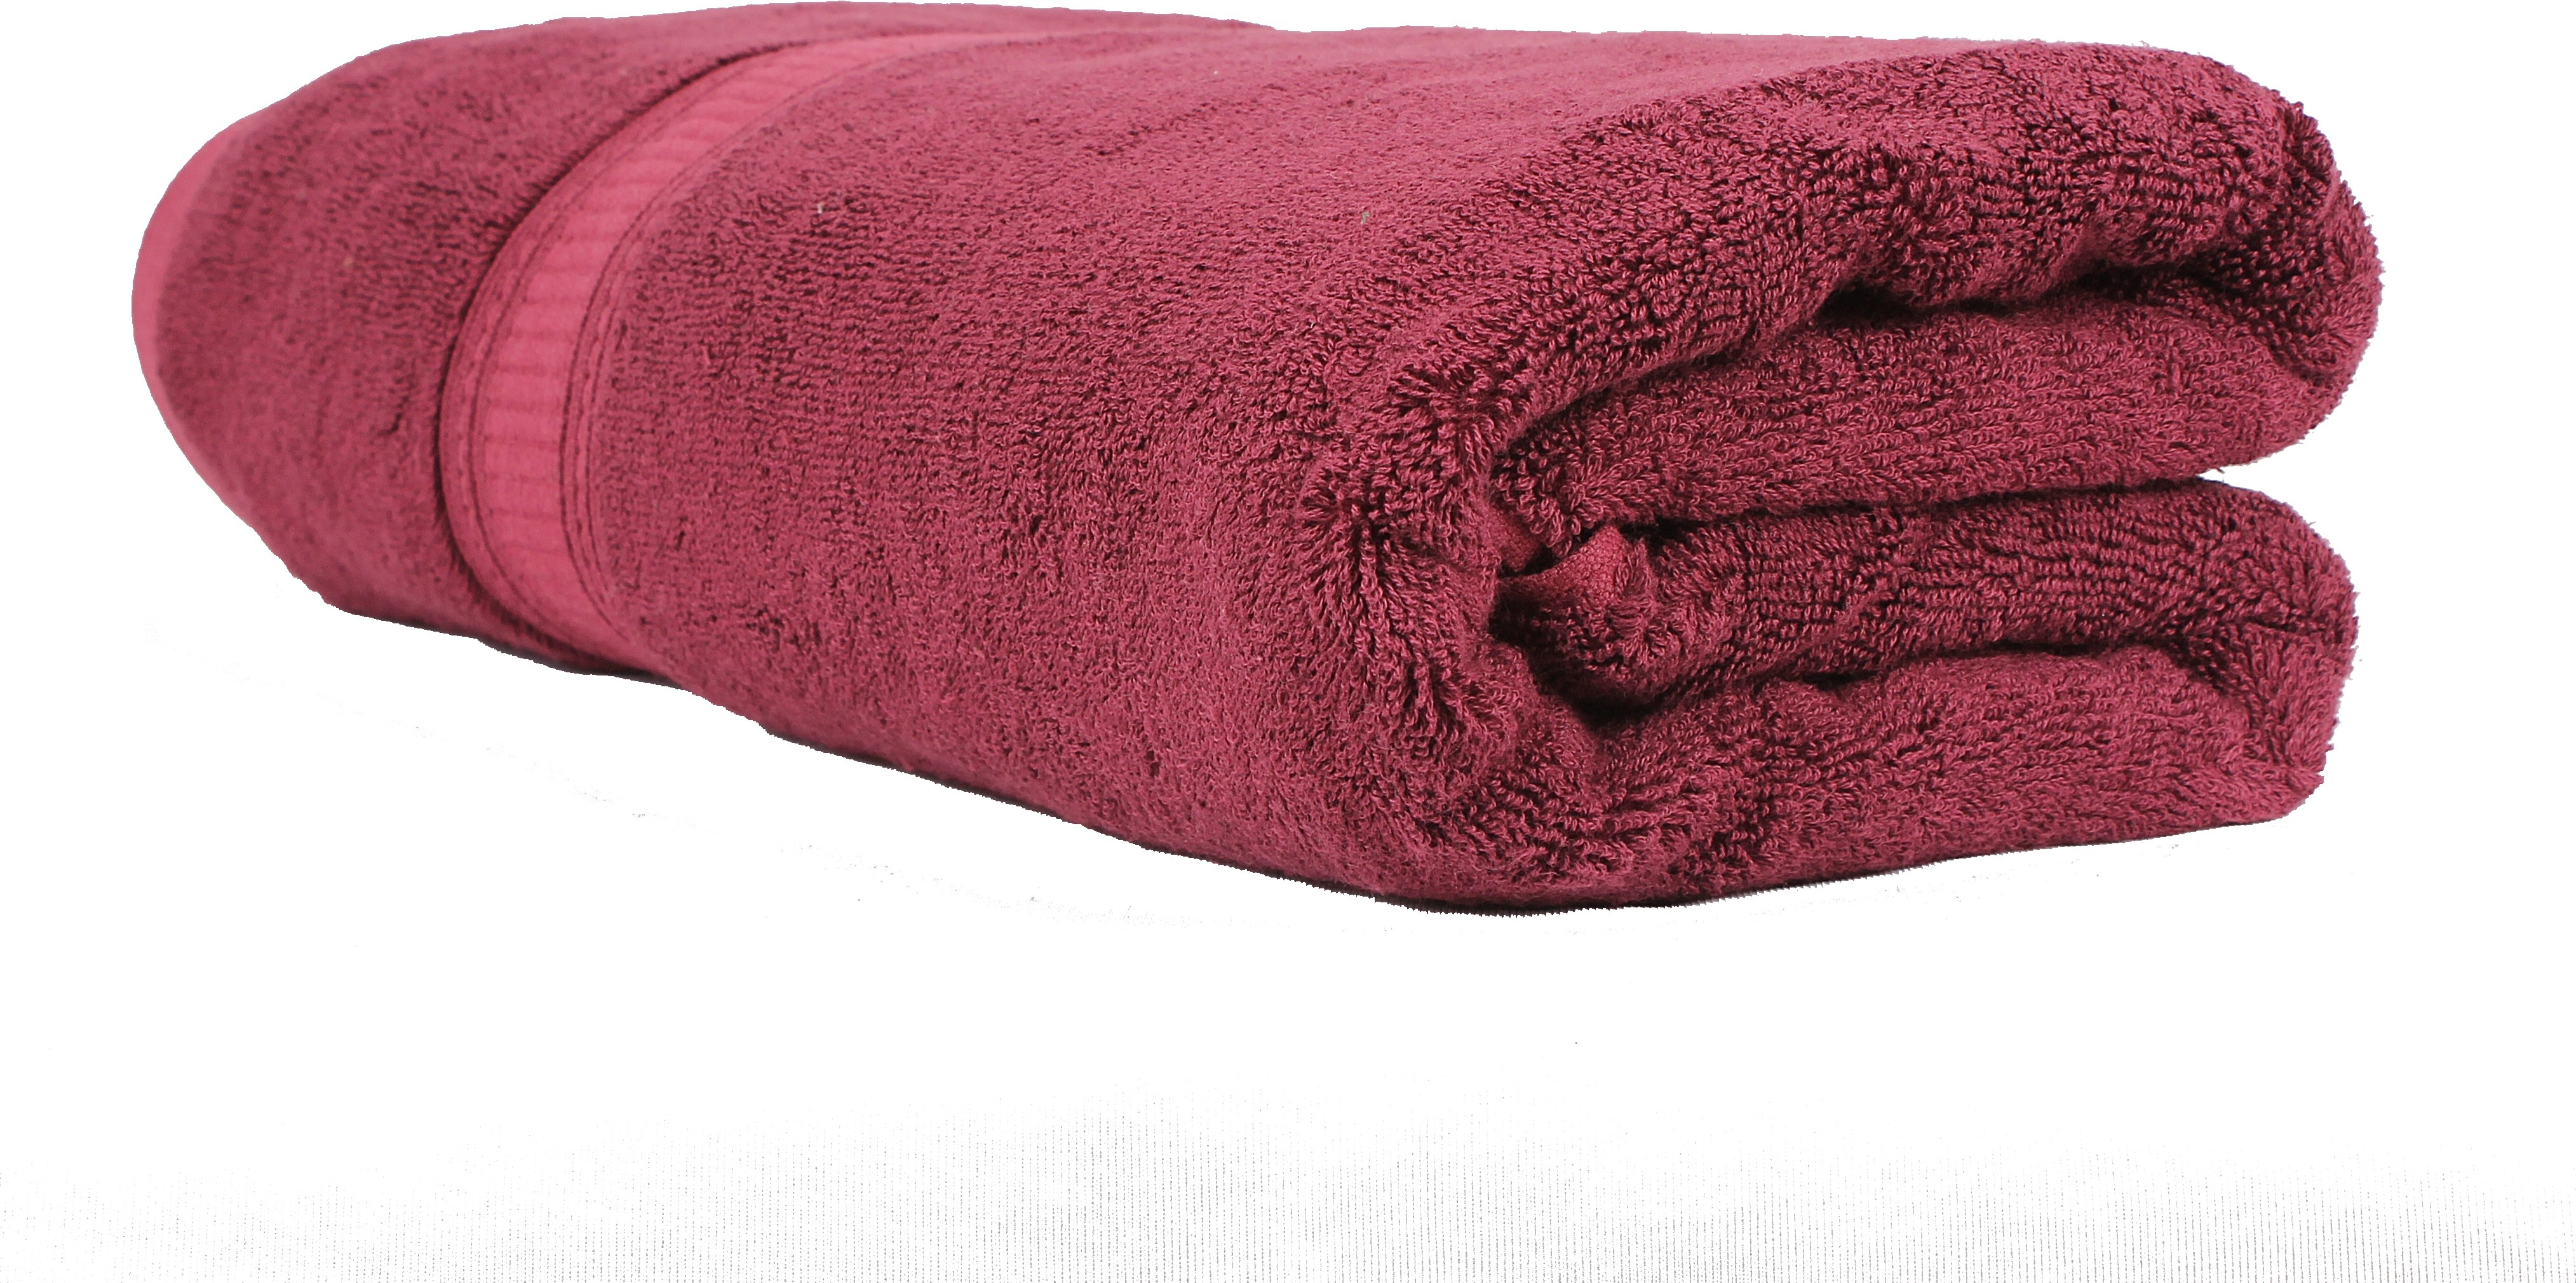 Trident Organica Cotton Bath Towel